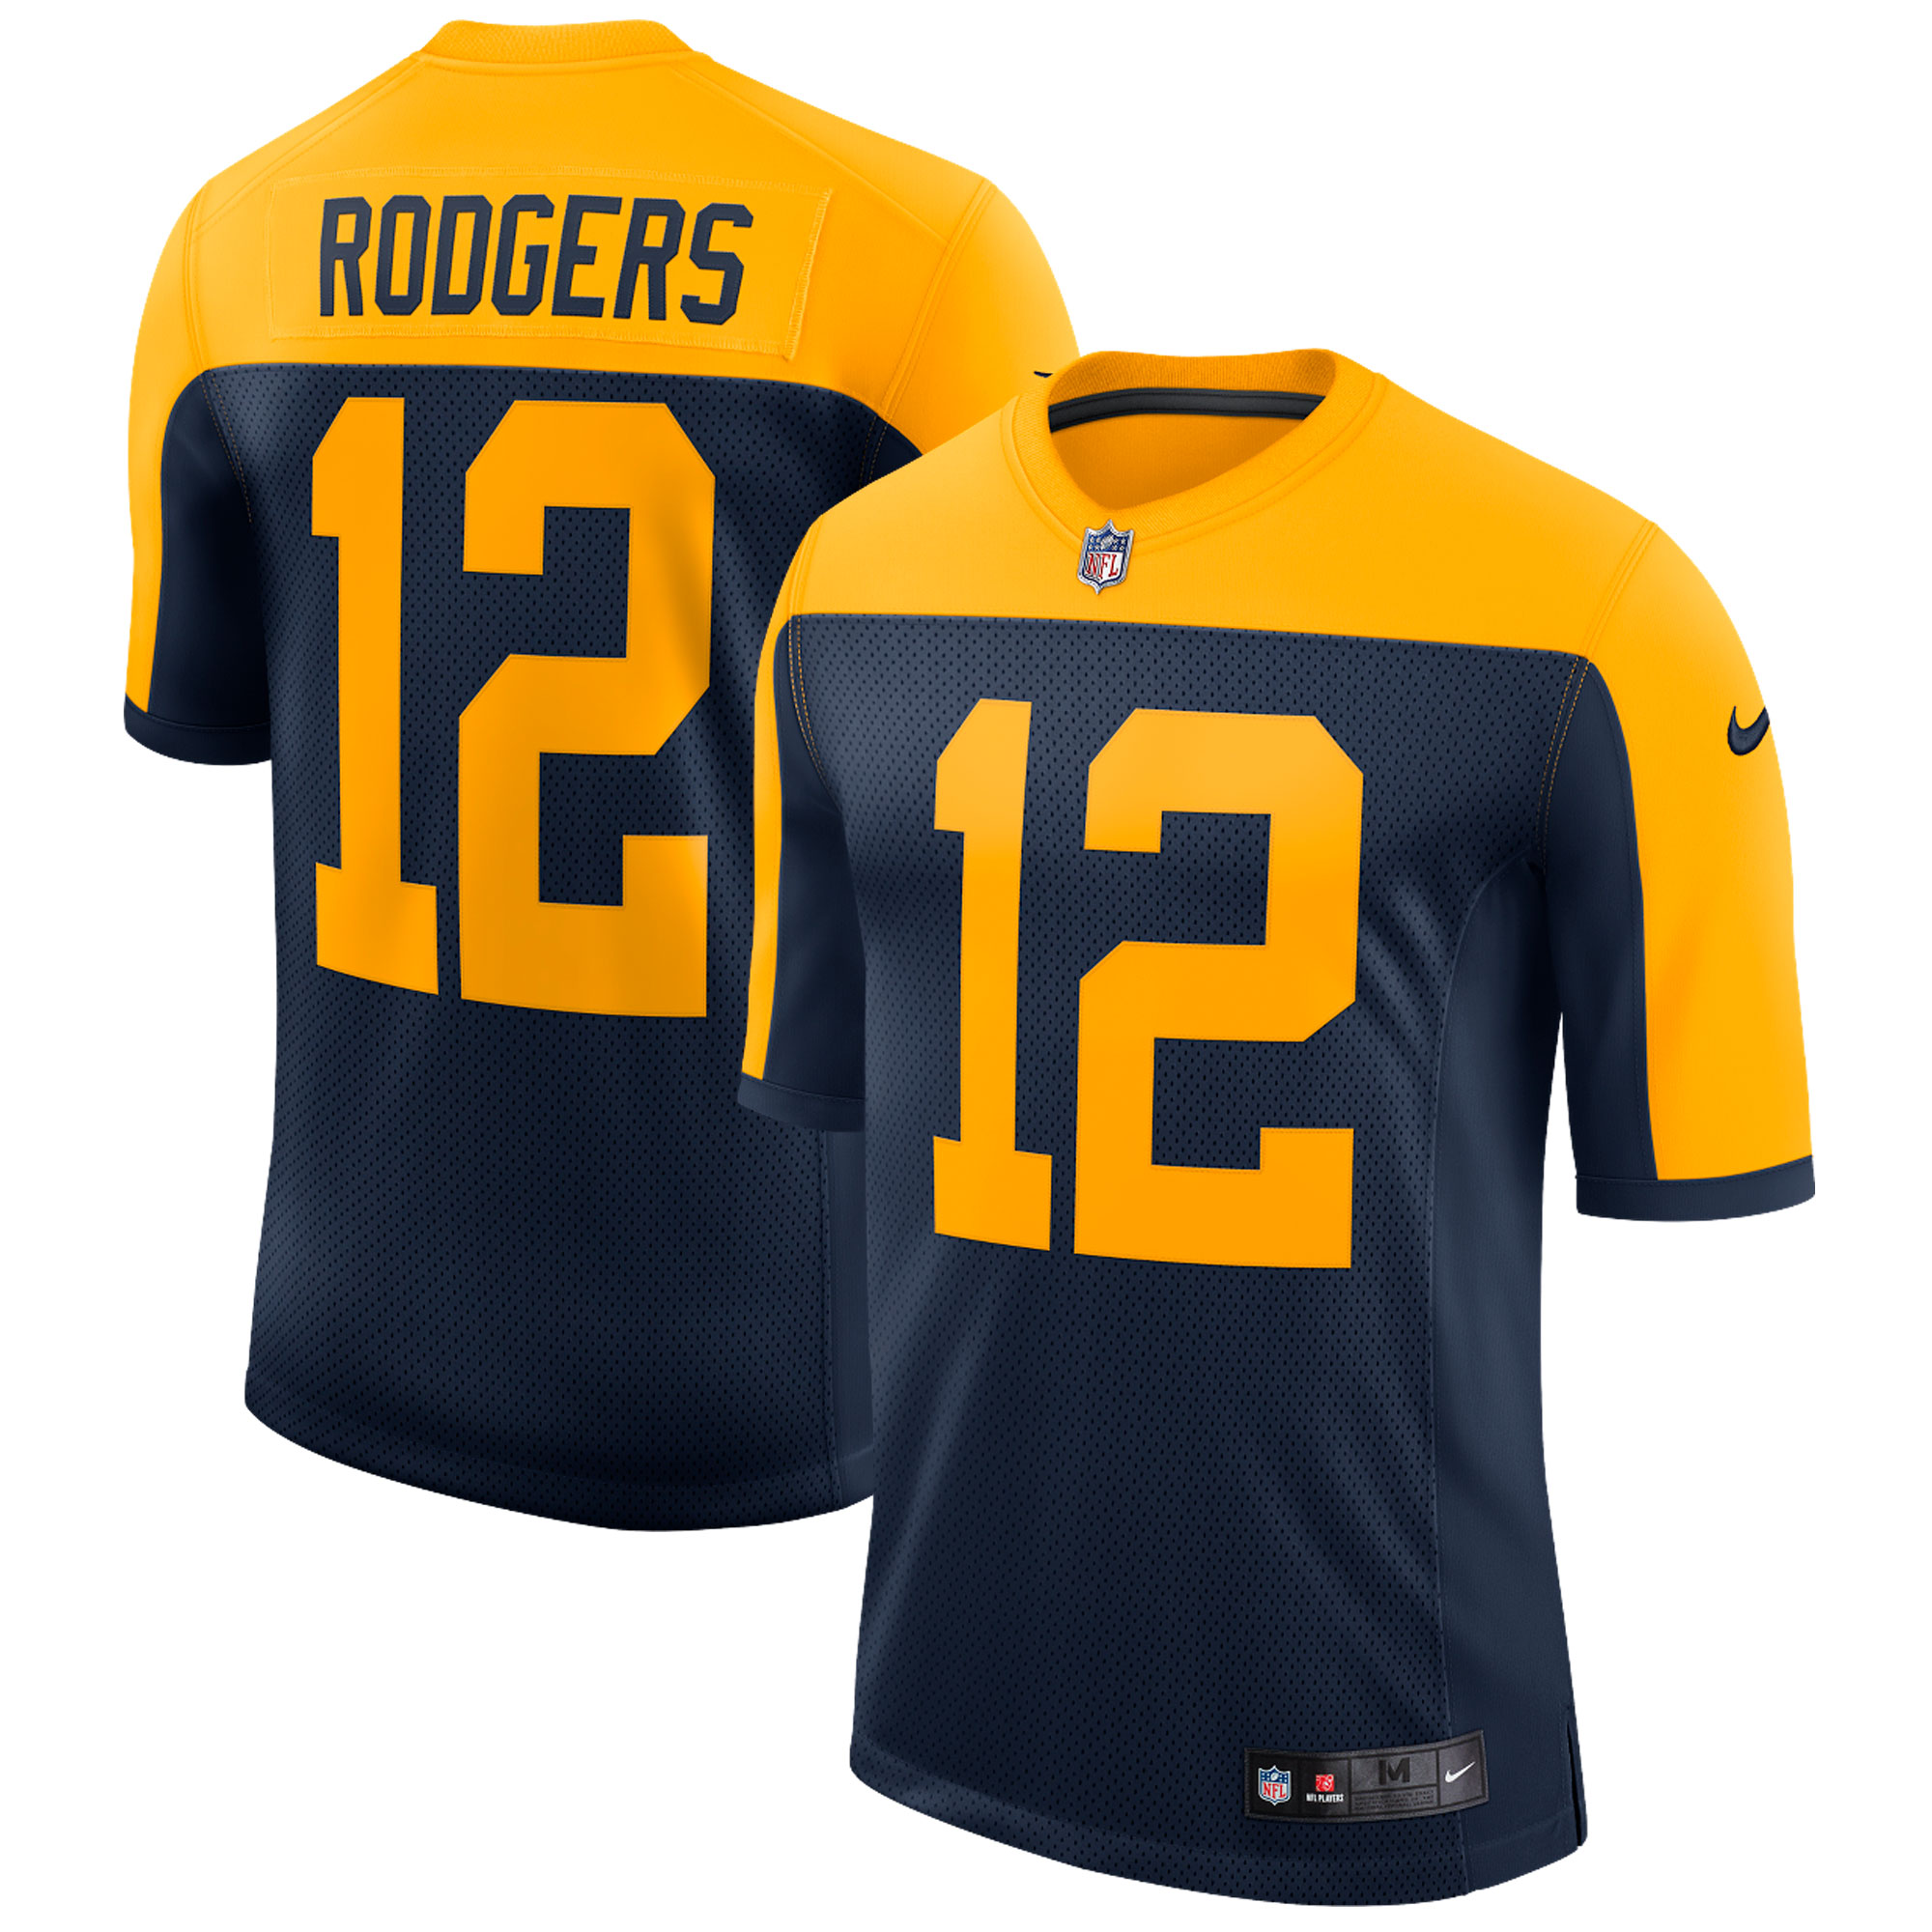 Green Bay Packers Ausweich Vapor Untouchable Limited Trikot - Aaron Rodgers - Herren